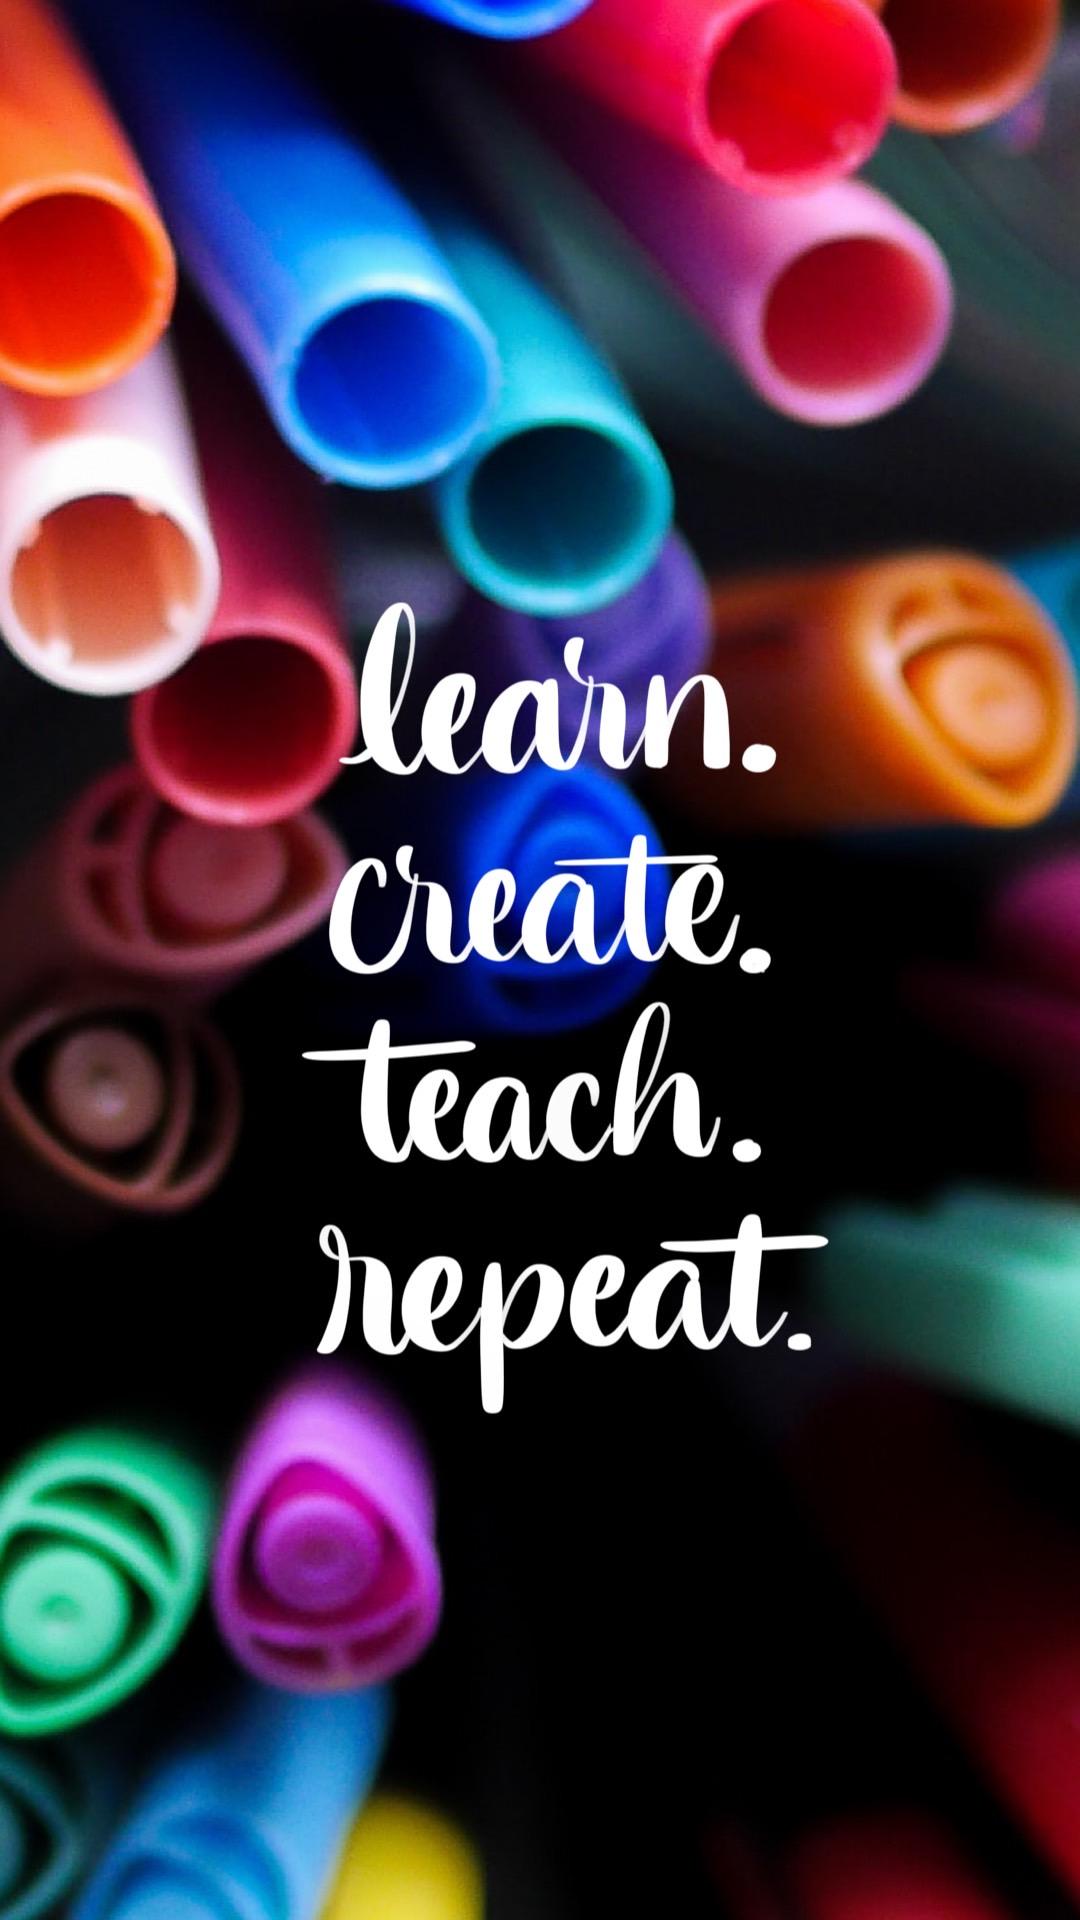 Learn create teach repeat